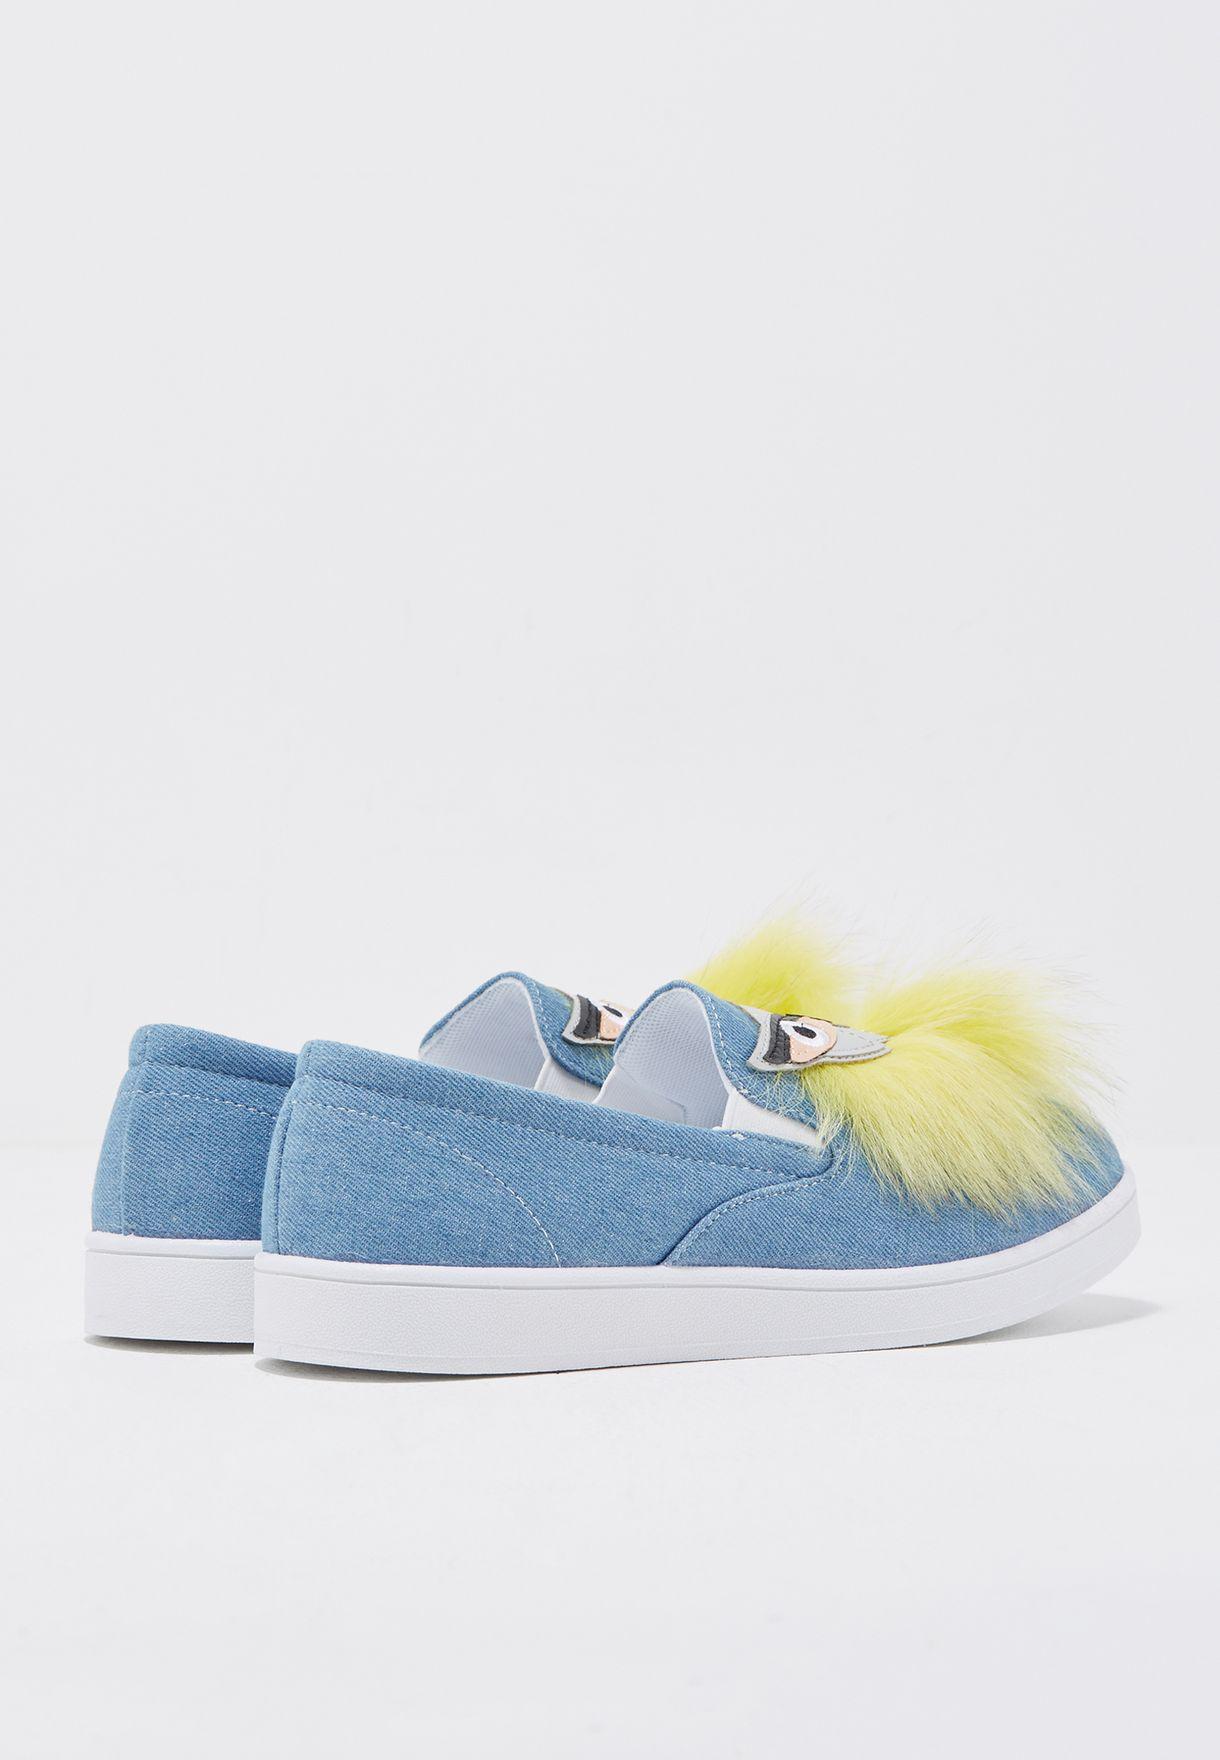 حذاء مزين بشكل بومة